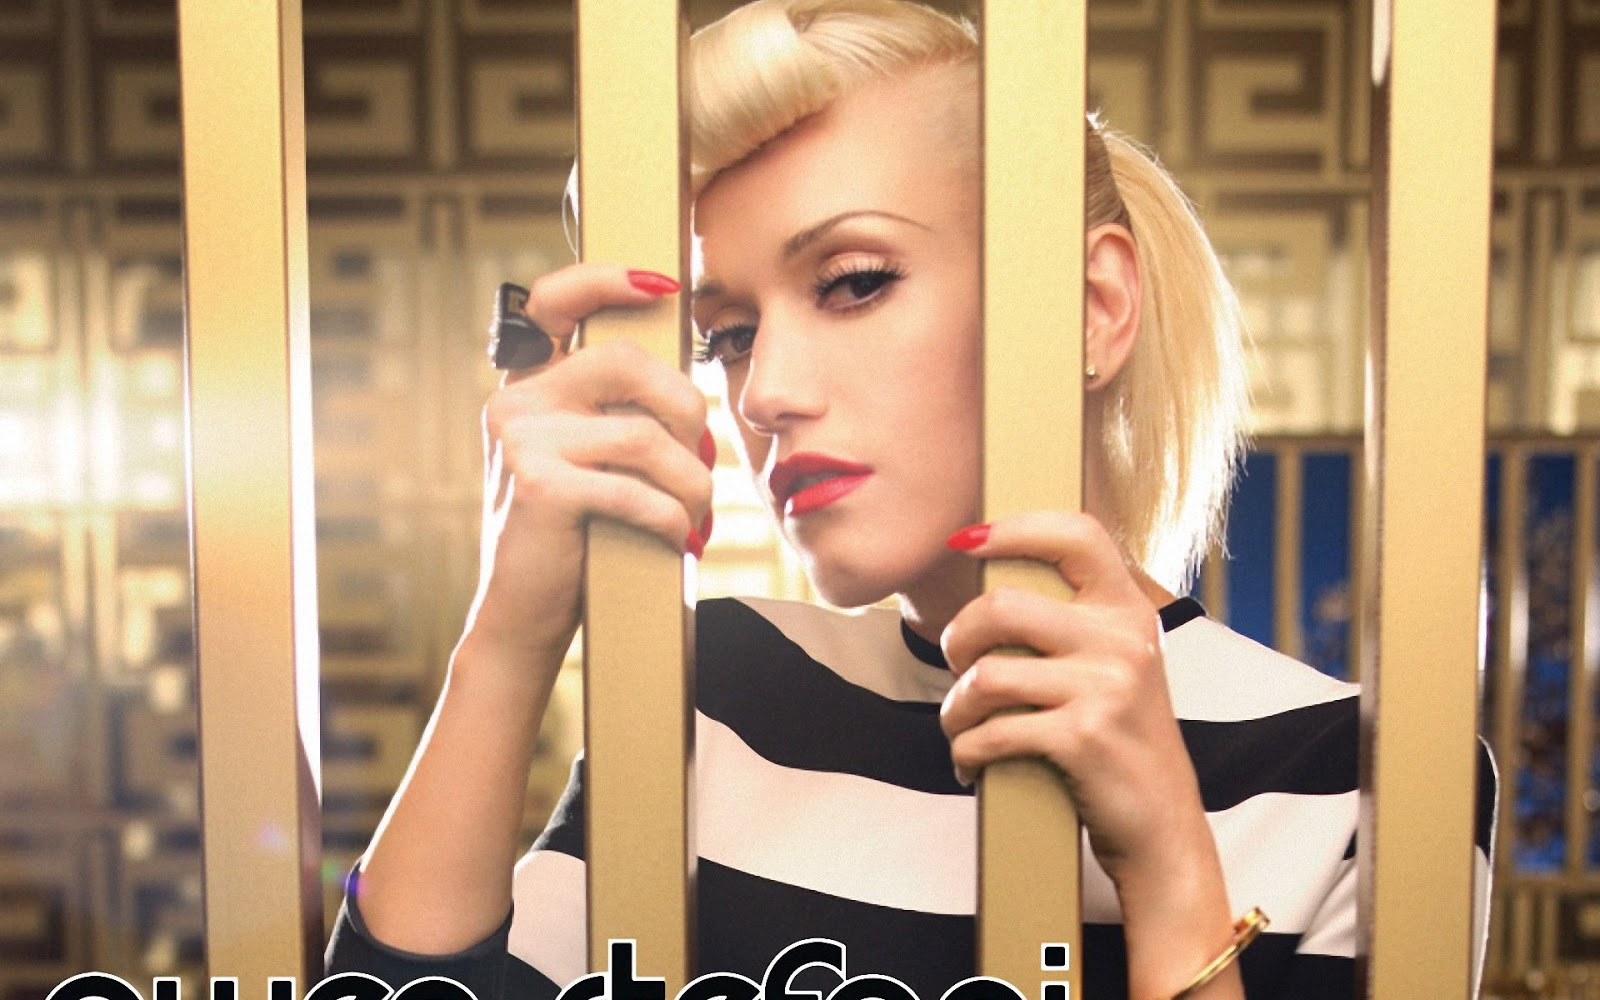 Hayden Panettiere Hd Wallpaper Gwen Stefani Hot Hd Wallpapers Nine Galleries